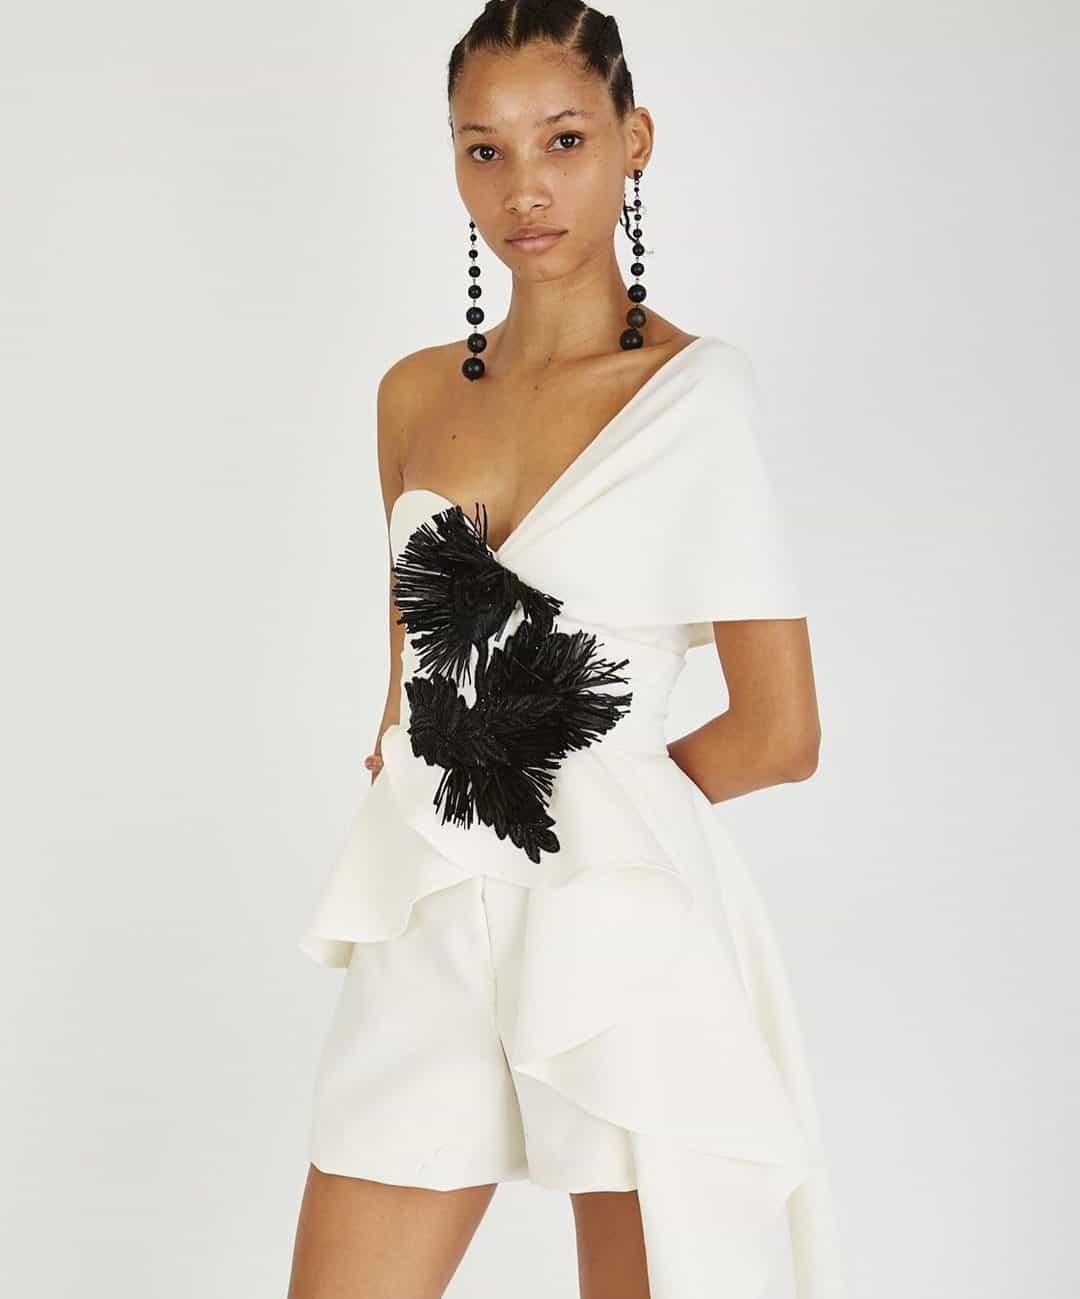 a short wedding dress with black and white details by Oscar de la Renta